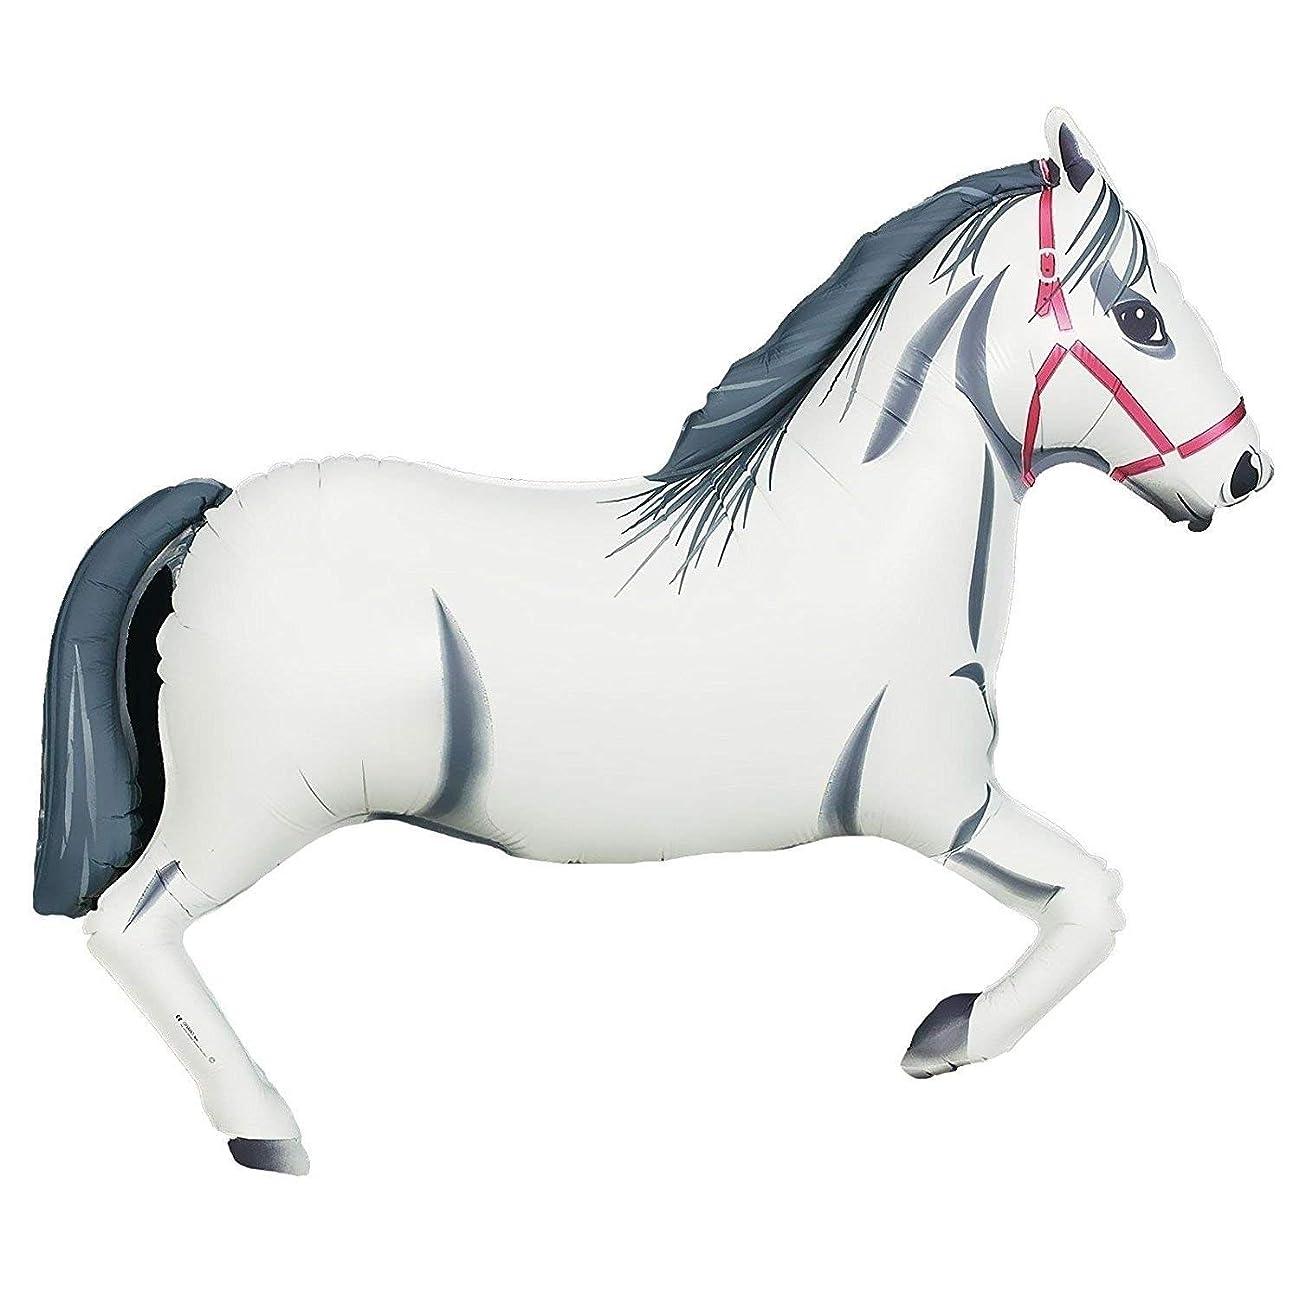 Oaktree Betallic 43 Inch Shape White Horse Packaged